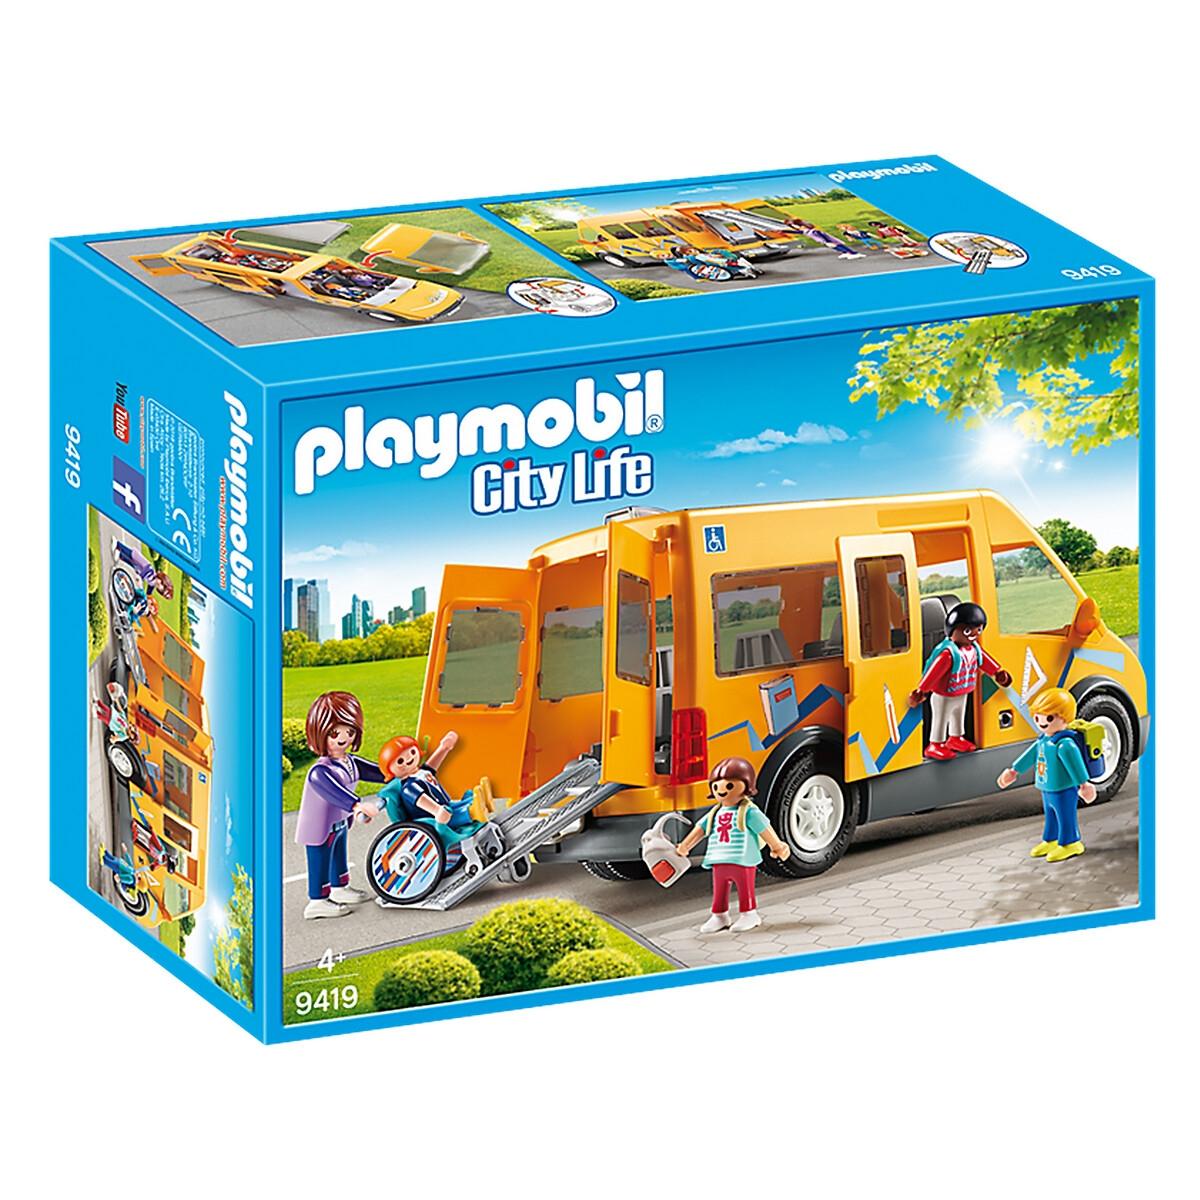 An image of Playmobil School Bus, 9419